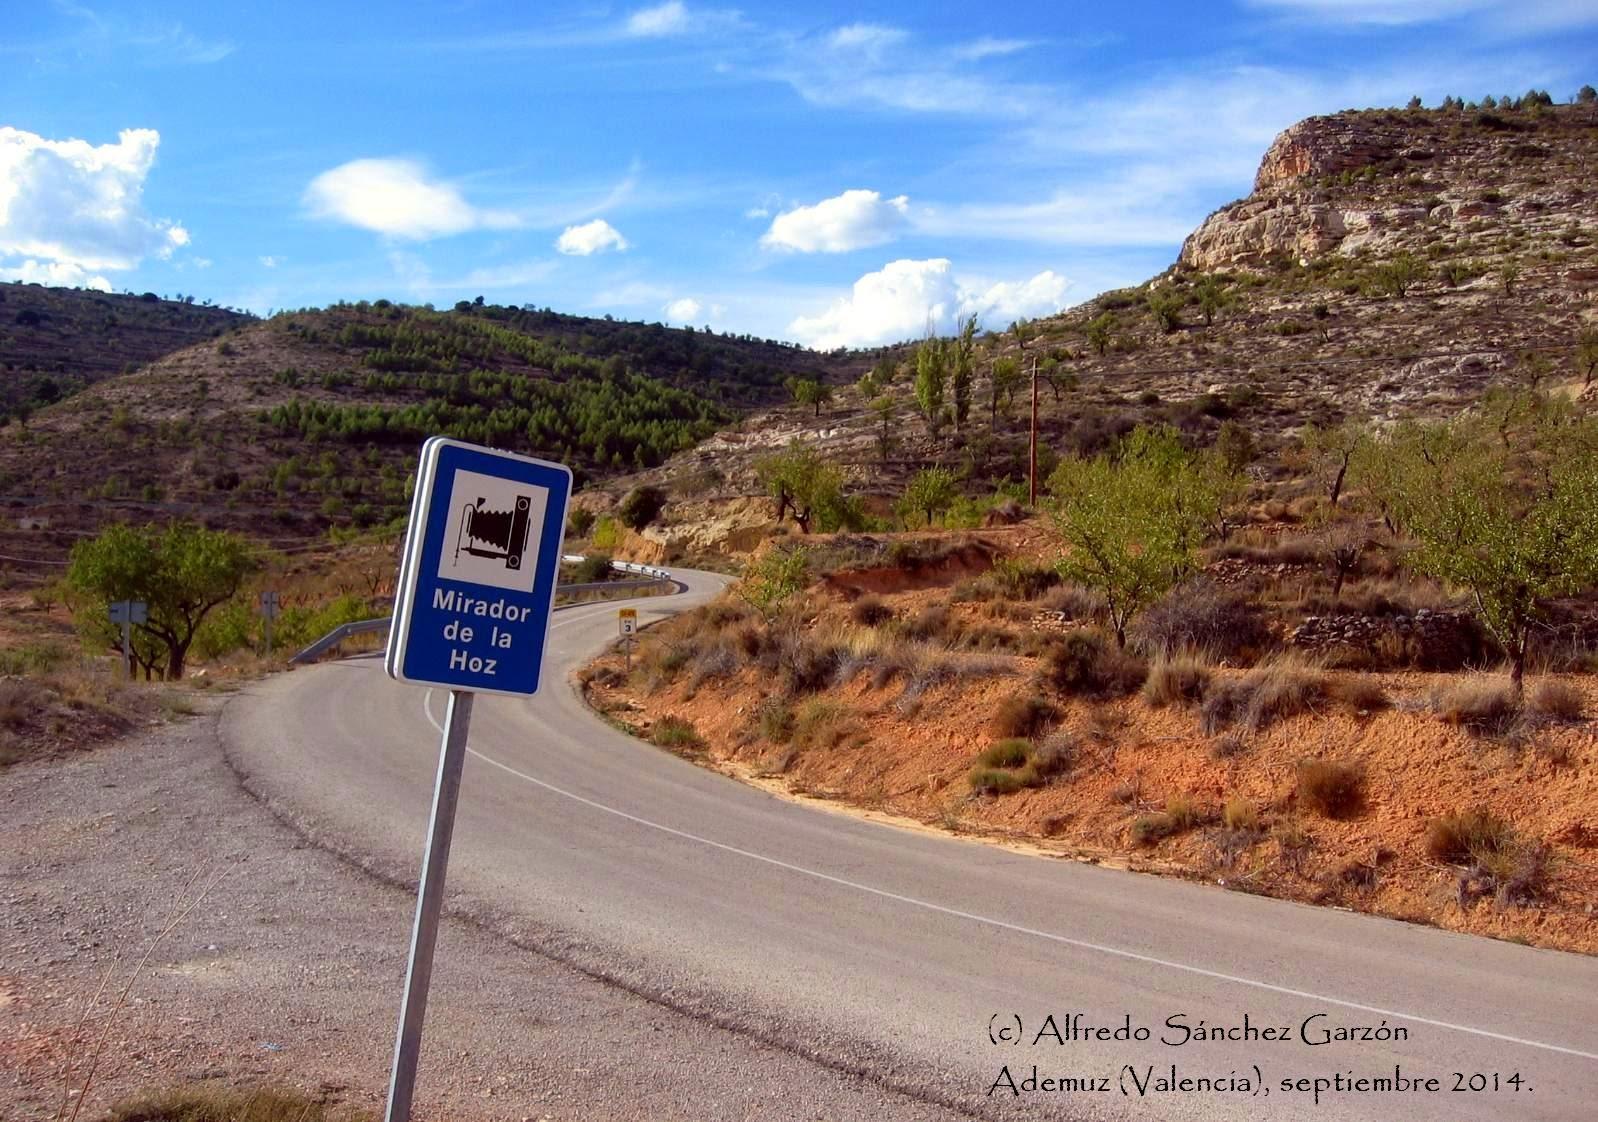 mirador-hoz-ademuz-carretera-vallanca